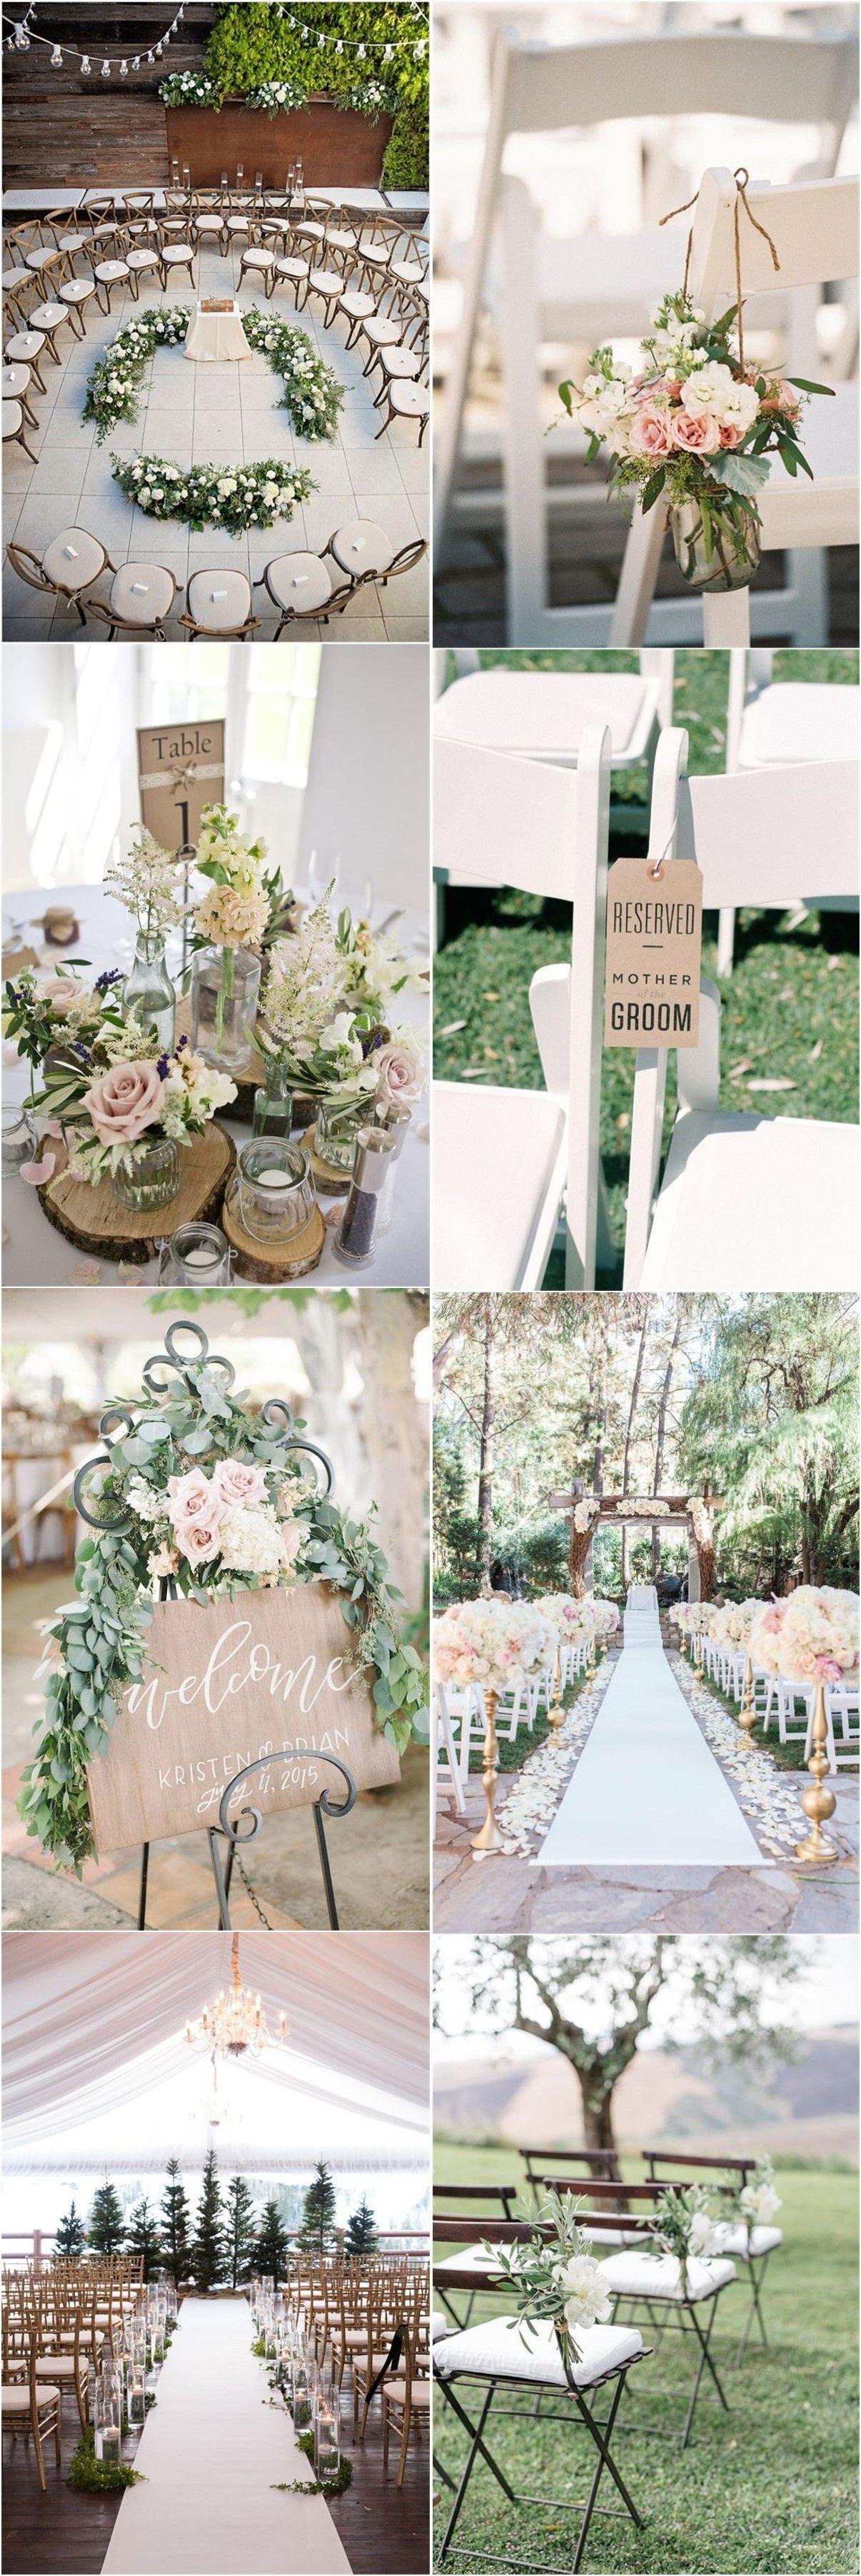 25 Rustic Outdoor Wedding Ceremony Decorations Ideas | Rustic ...